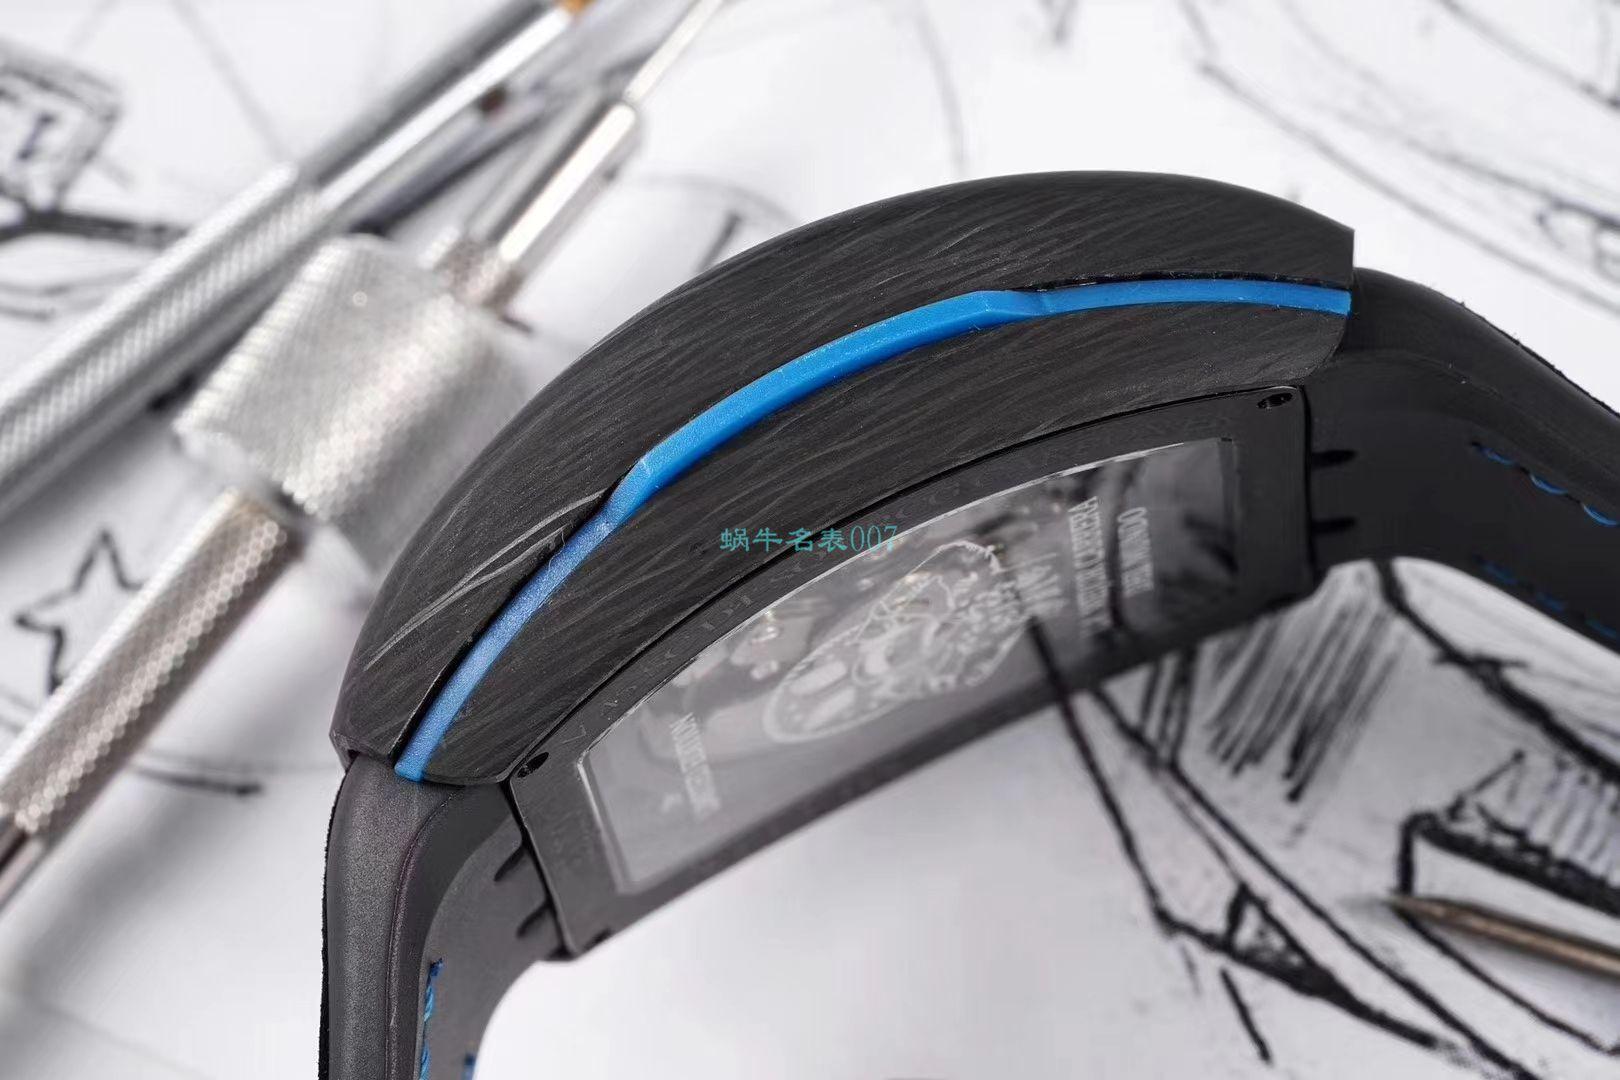 TW厂推出法穆兰碳纤维WPHH 2020 Vanguard™ Racing镂空系列腕表 / FL070